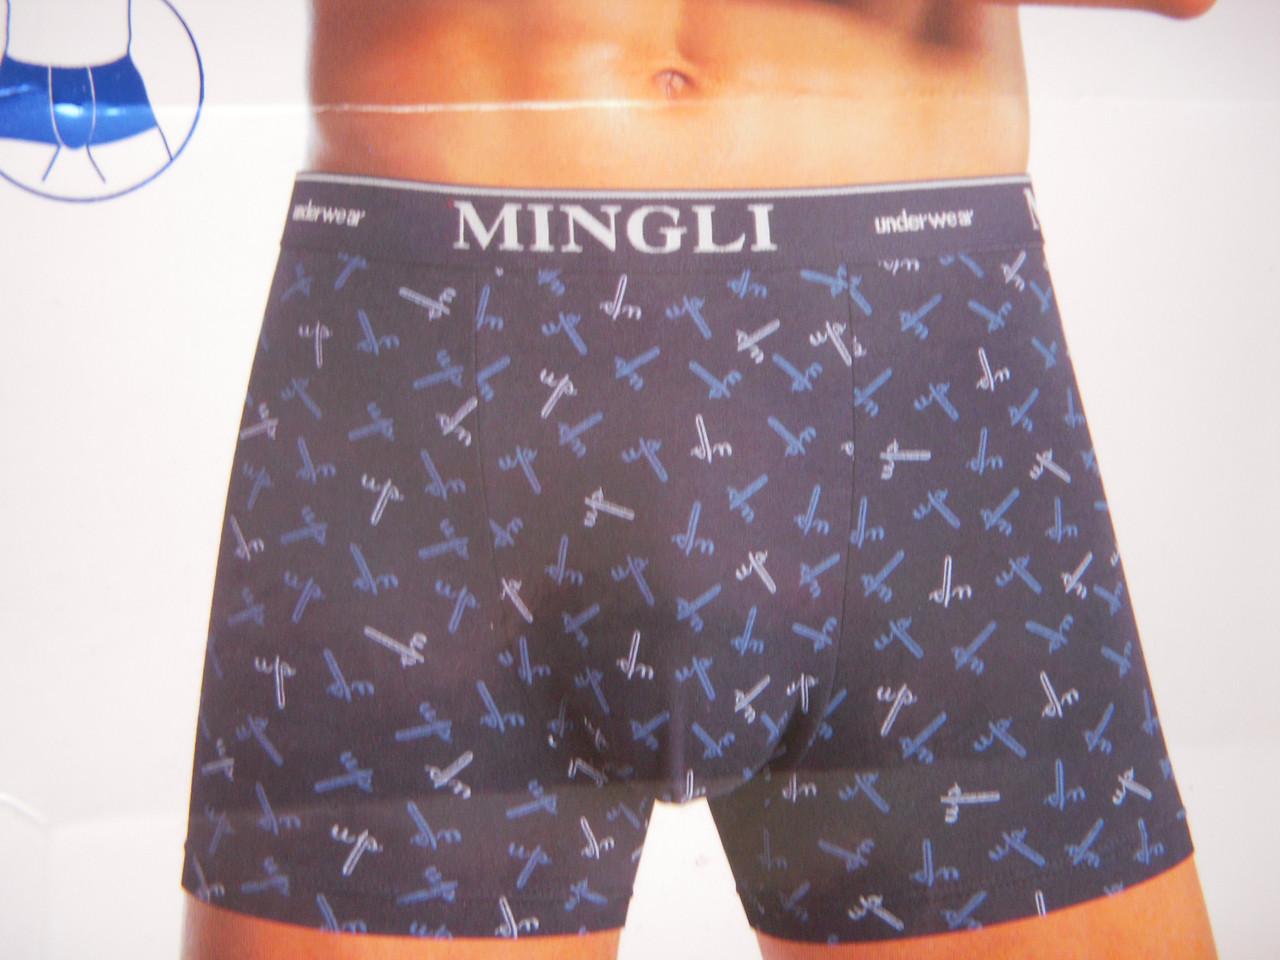 Боксеры Mingli   L